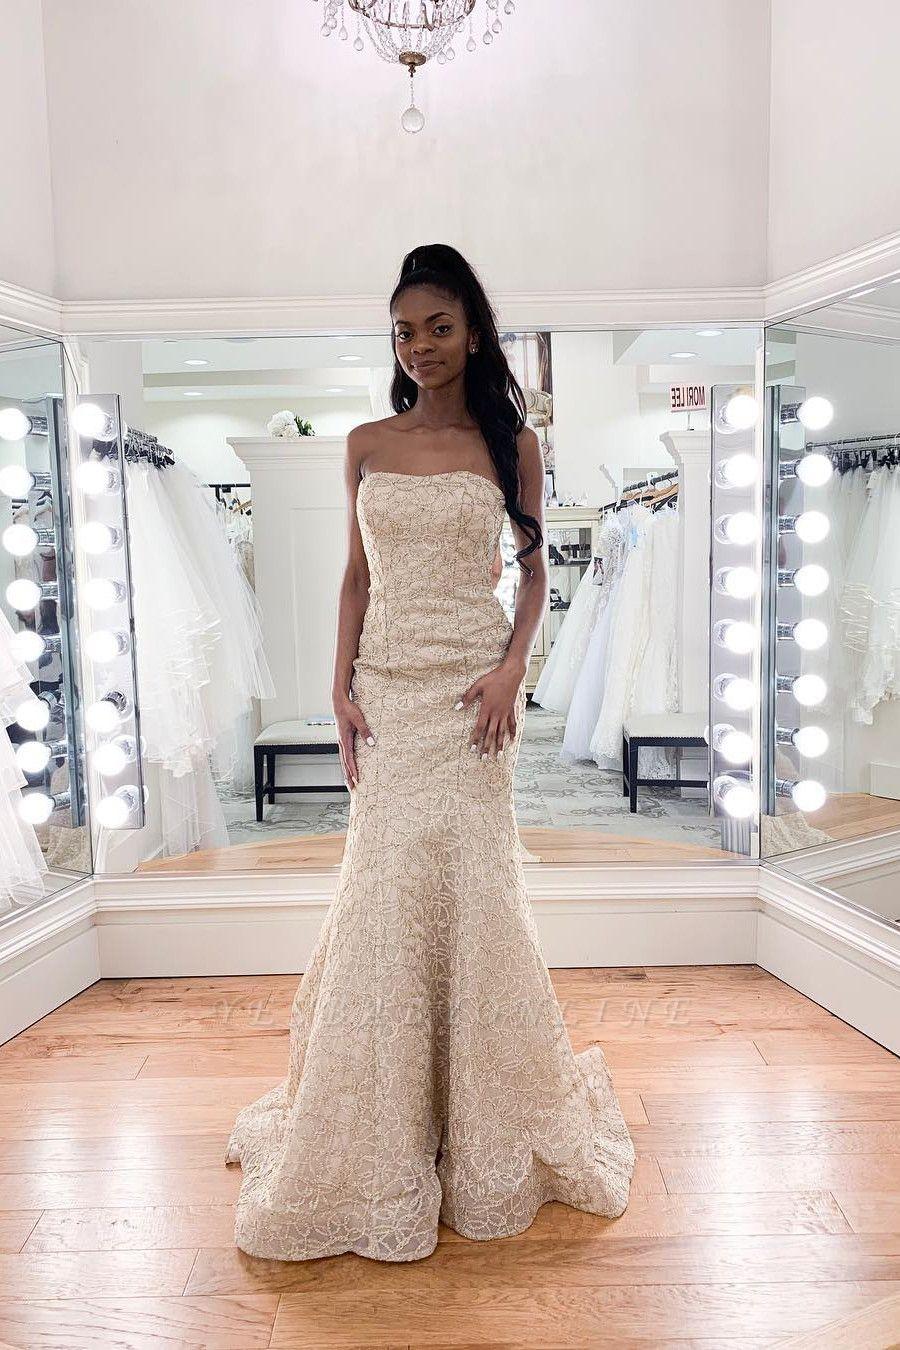 Charming Strapless Beaded Mermaid Wedding Dress | Affordable Sleeveless Long Bridal Dress